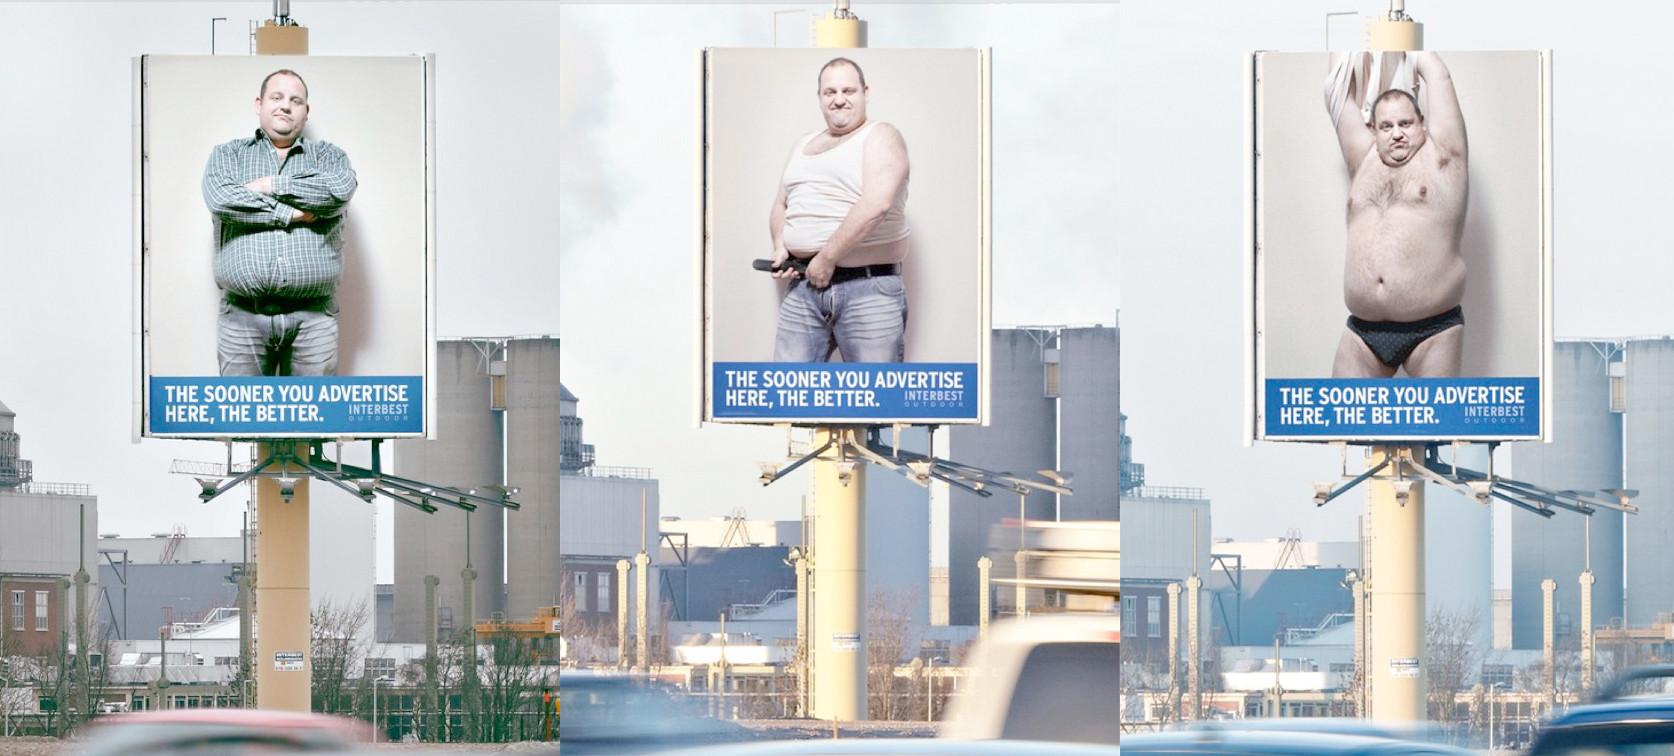 billboard-sooner-you-advertise-better